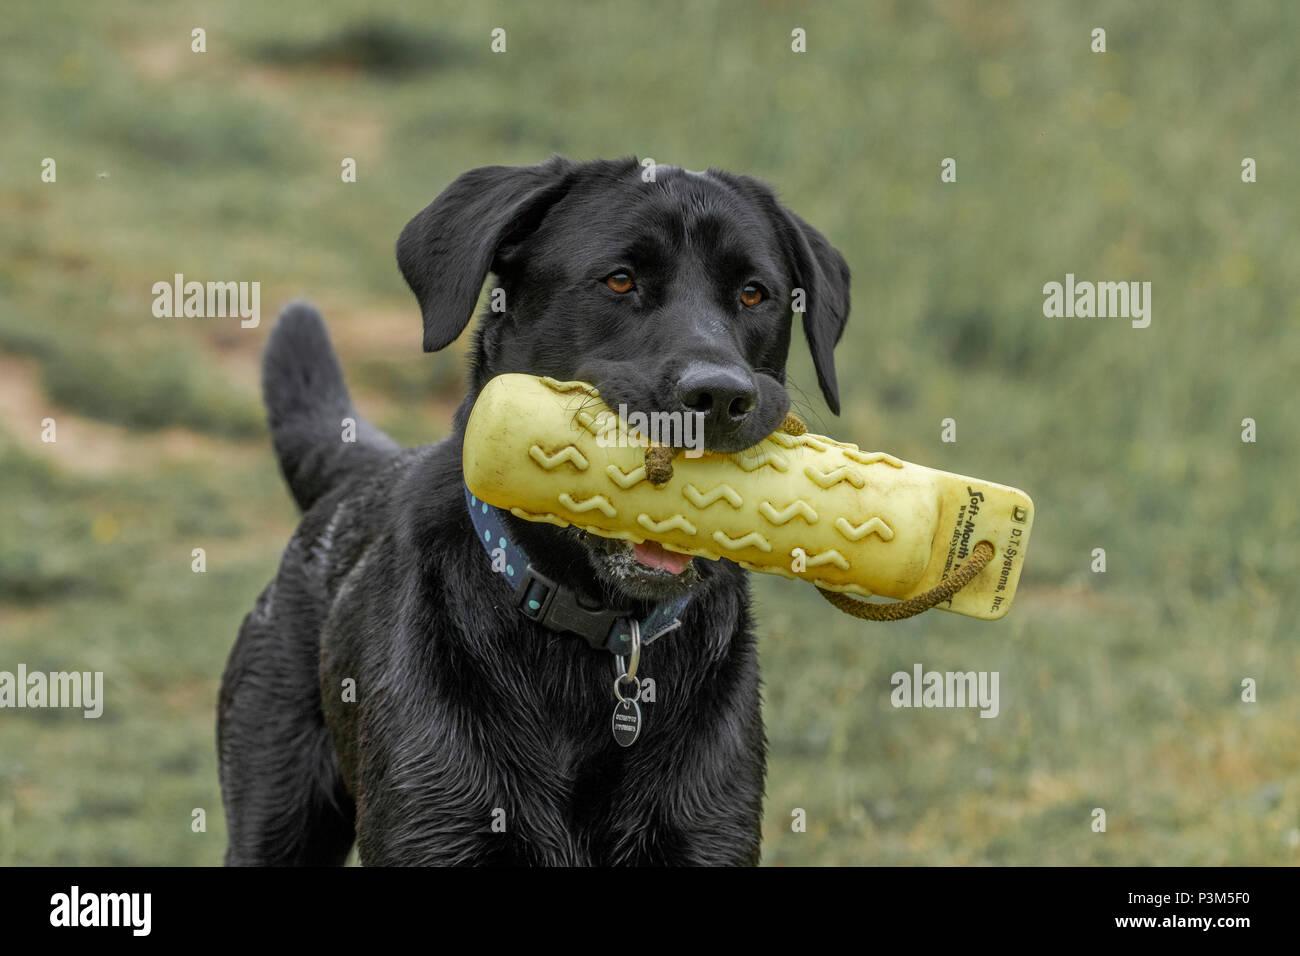 Black labrador holding a gun dog dummy in his mouth. Stock Photo